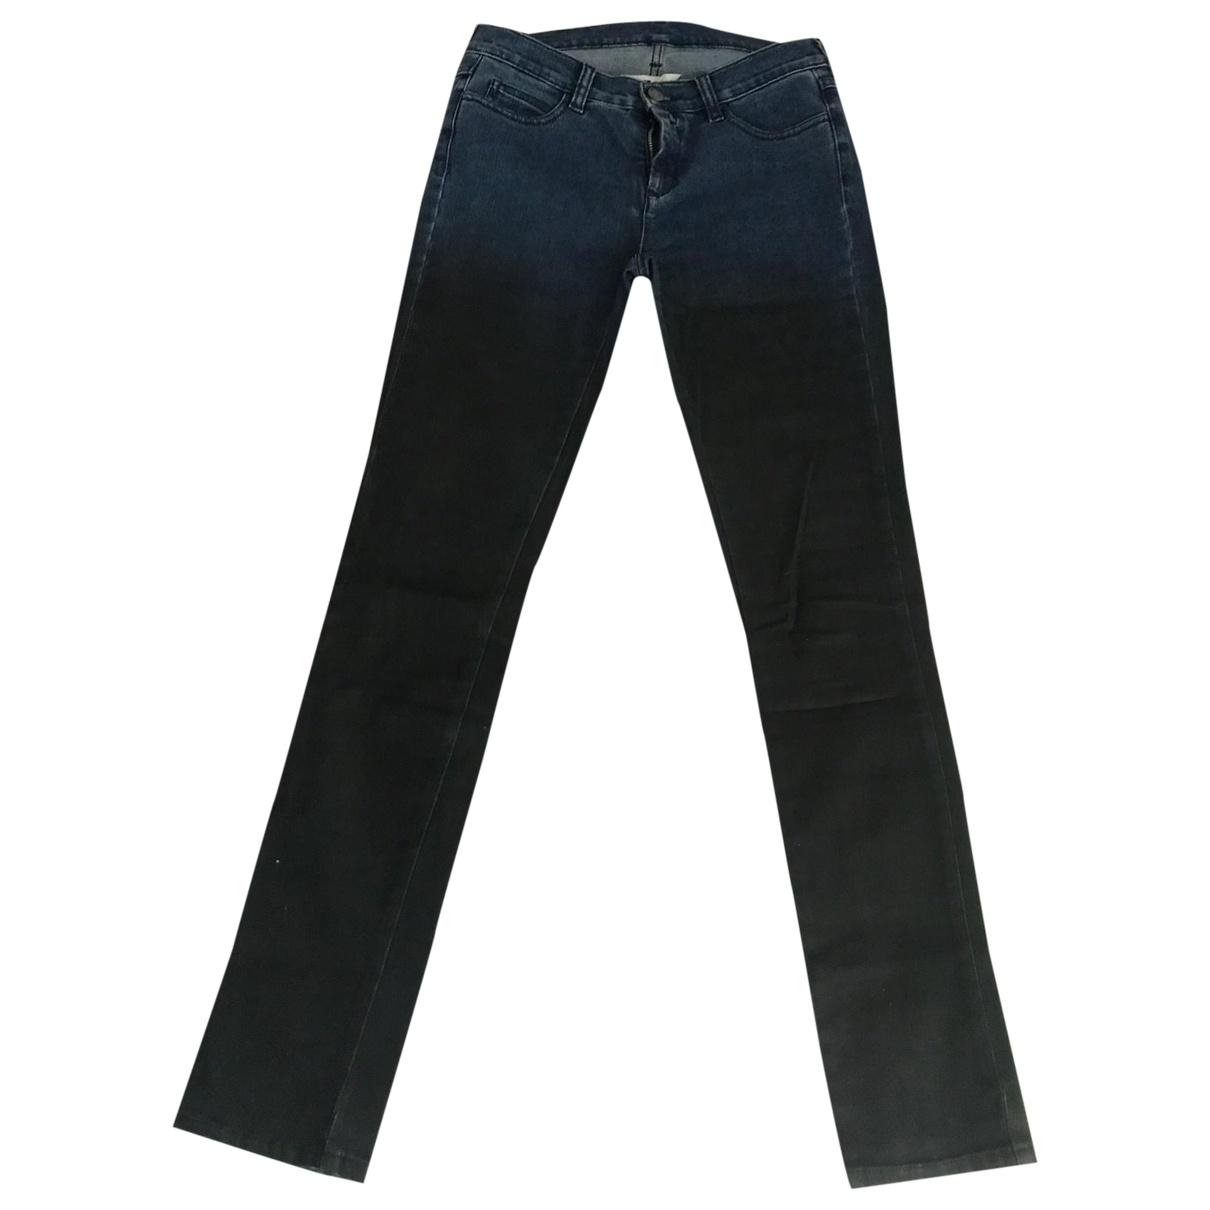 Mm6 \N Blue Denim - Jeans Jeans for Women 38 FR